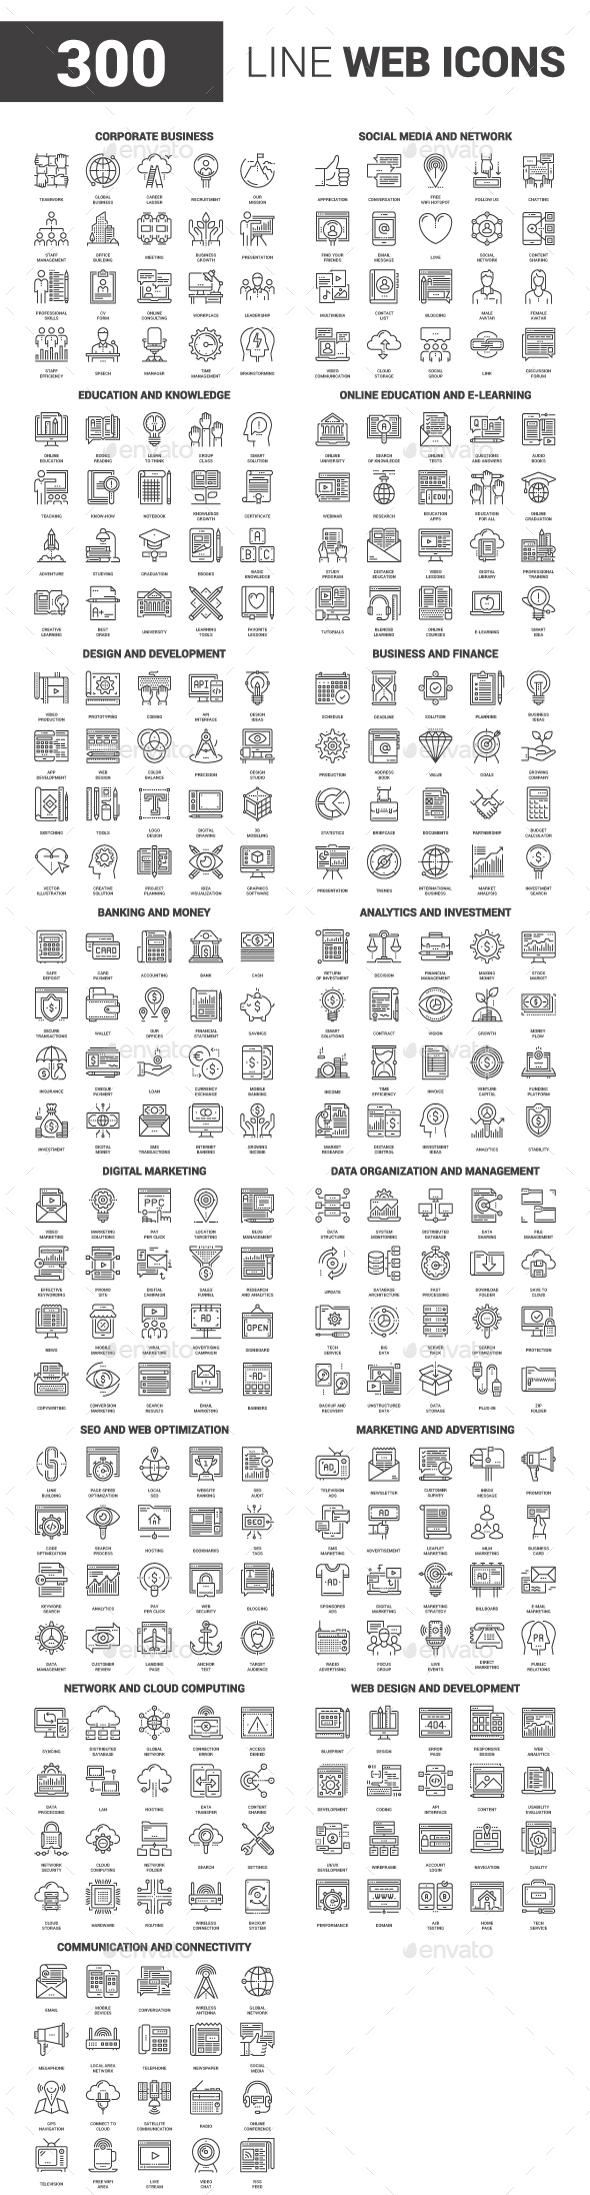 300 Line Web Icons Bundle